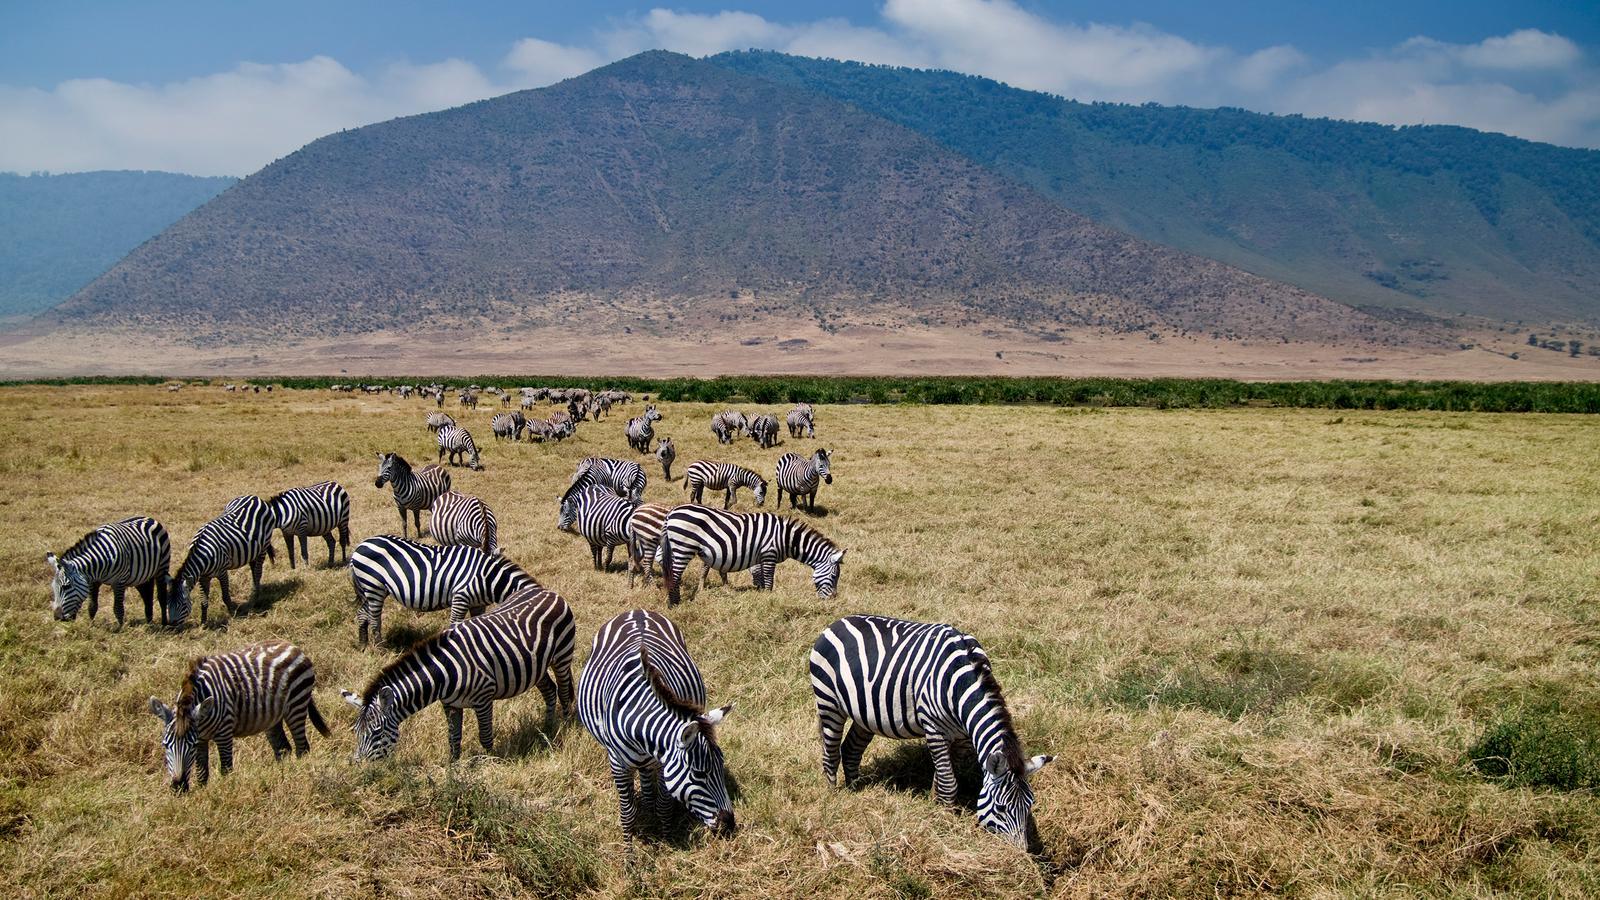 Erlebnisreise durch tansania & sansibar in tansania afrika g